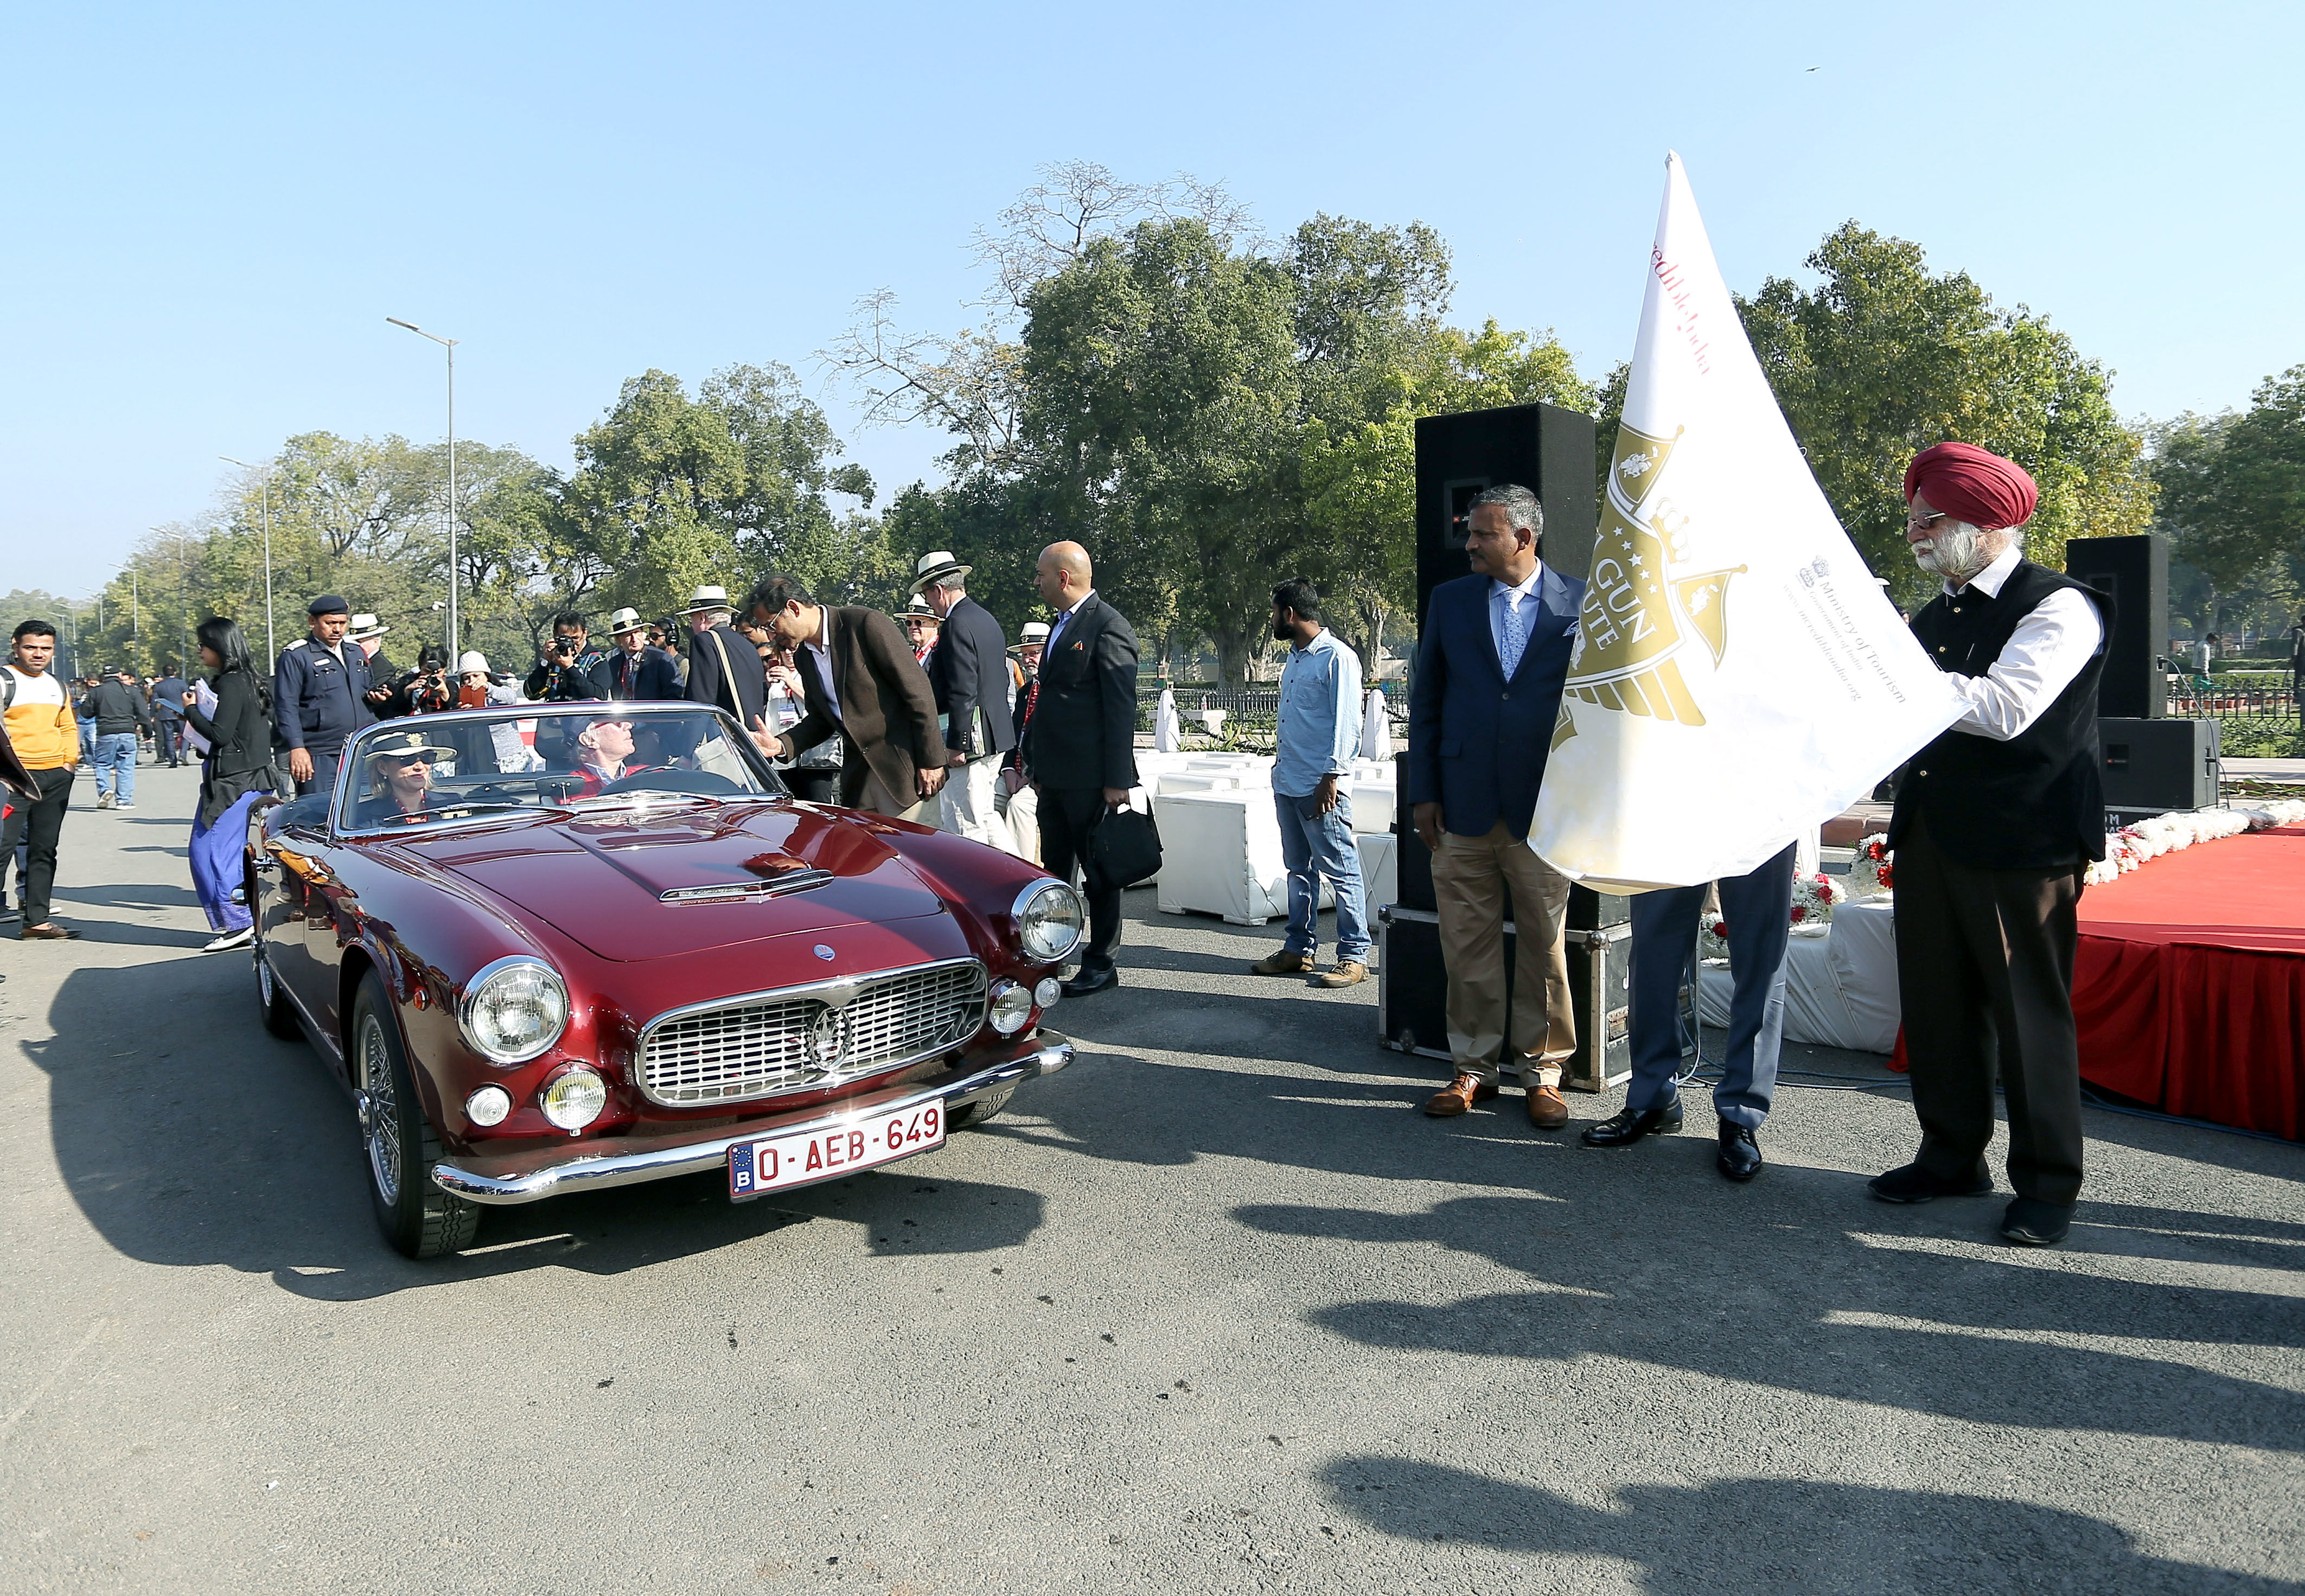 Rajya Sabha MP KTS Tulsi flags off the 21 Gun Salute International Vintage Car Rally, at India Gate, in New Delhi on Saturday. (ANI Photo)